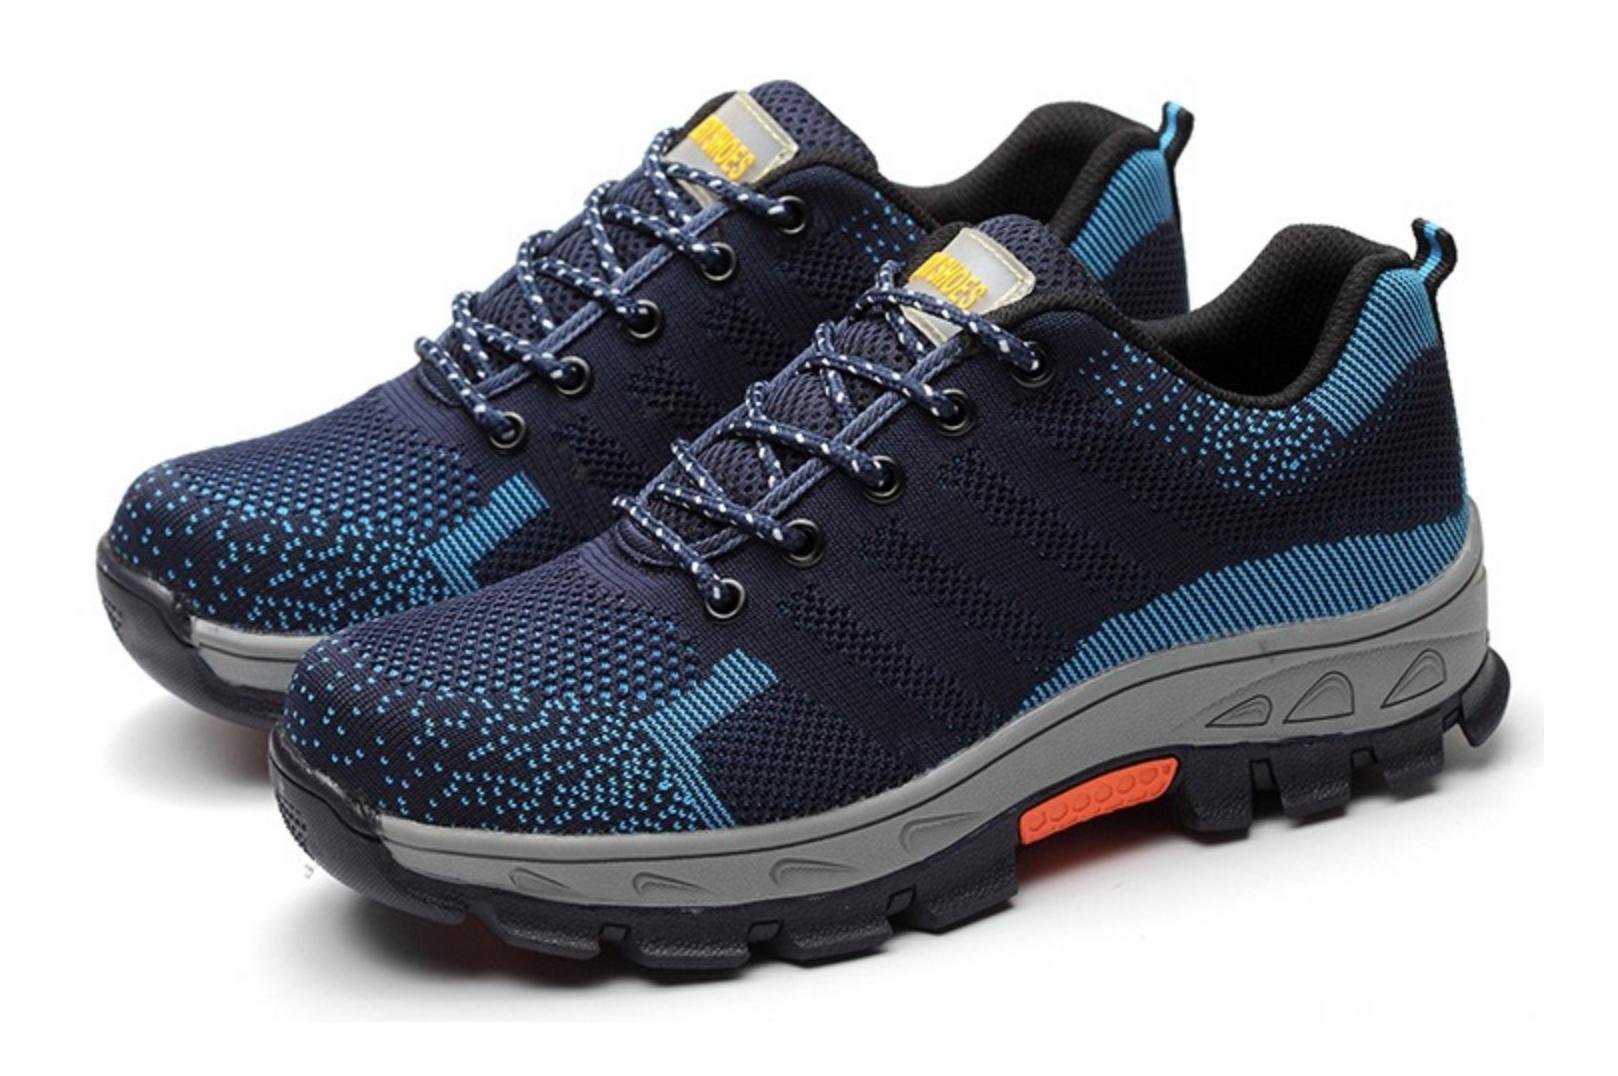 Buy Top Formal Shoes Online Boots Sepatu Sneakers Pria Rc121